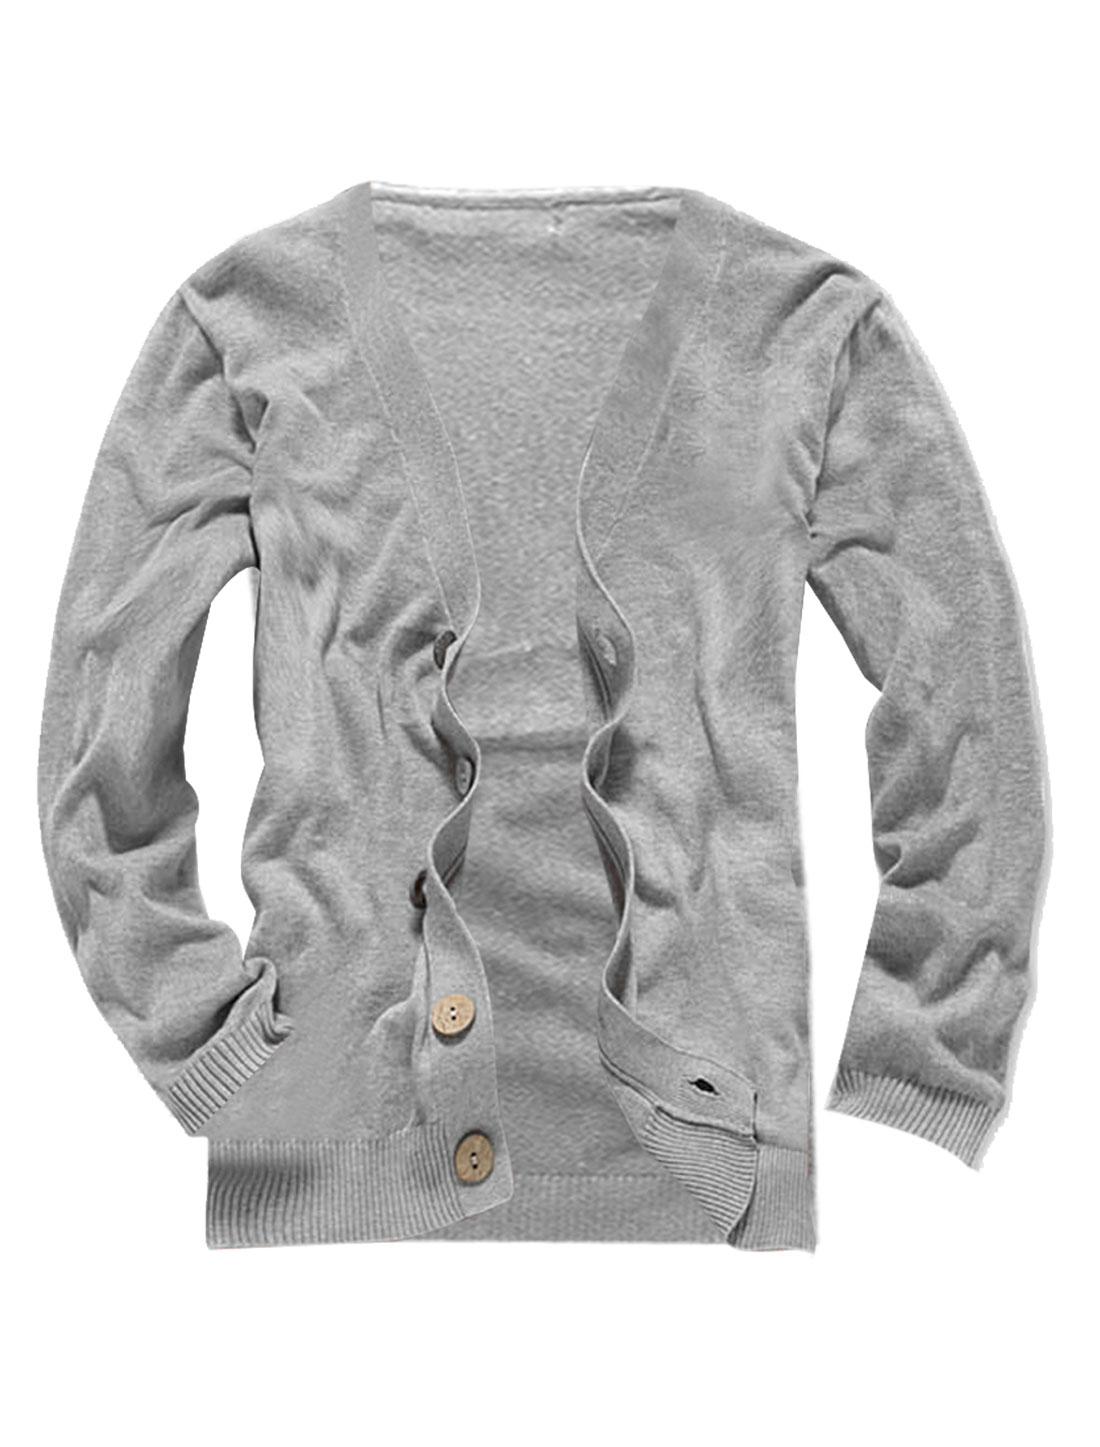 Men Light Gray Knitting Wooden Buttons Detail Leisure Cardigan S